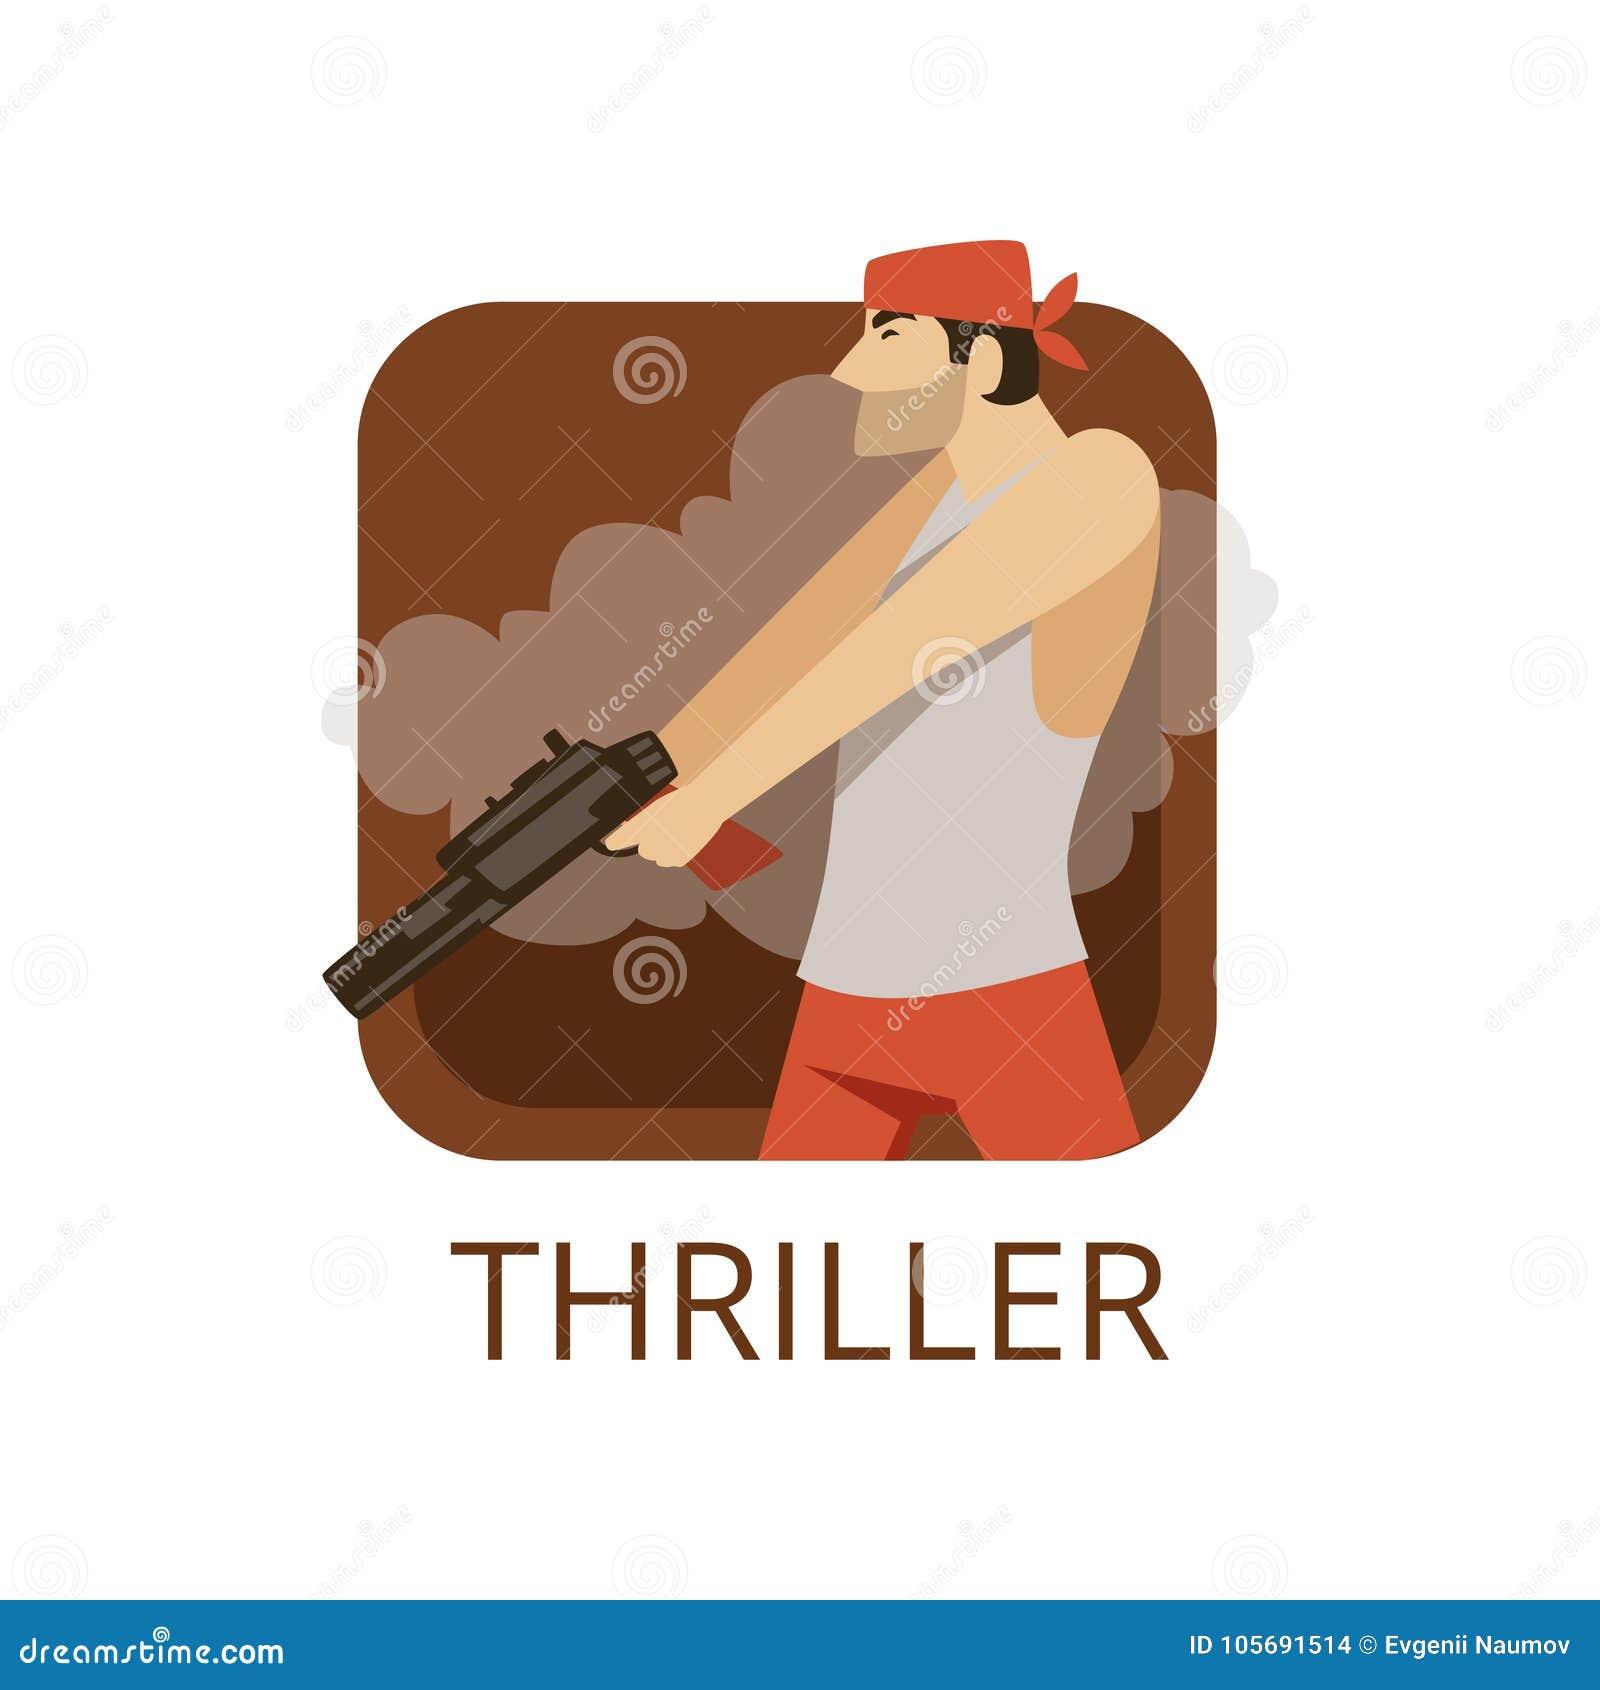 Thriller cinema genre symbol for cinema or channel thriller cinema genre symbol for cinema or channel cinematography movie production vector illustration biocorpaavc